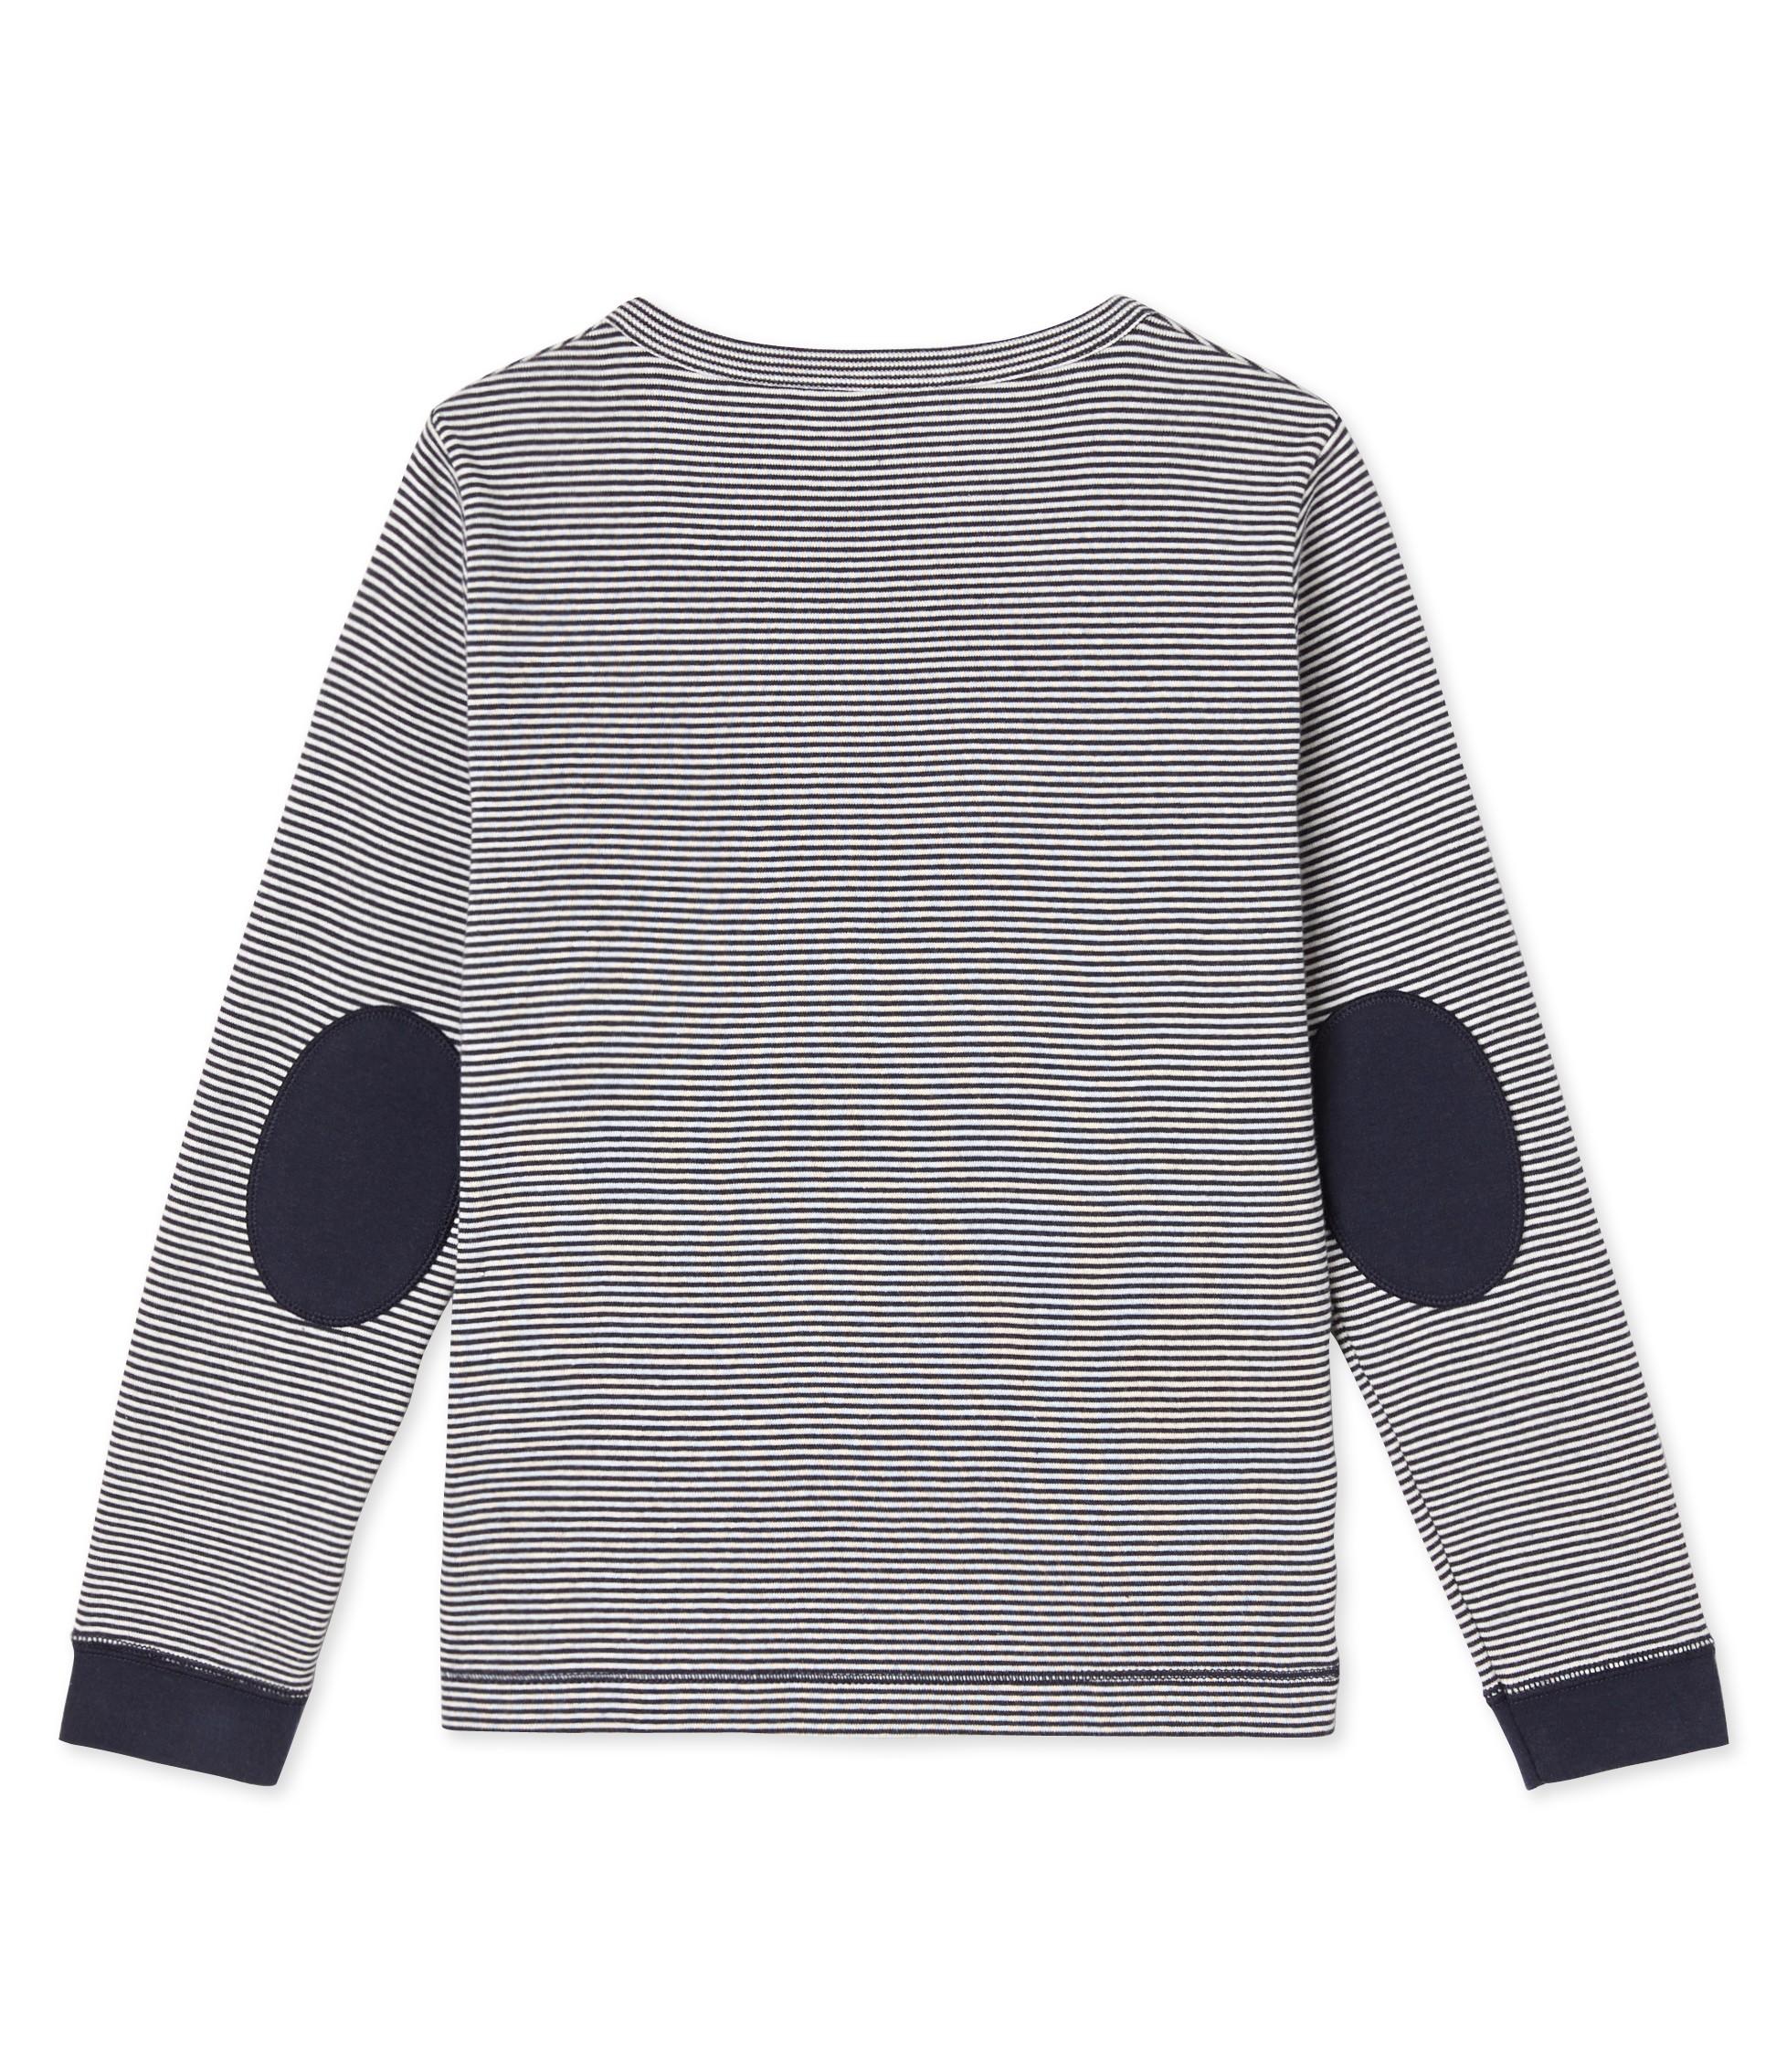 Boy 39 s long sleeved striped t shirt petit for Petit bateau striped shirt